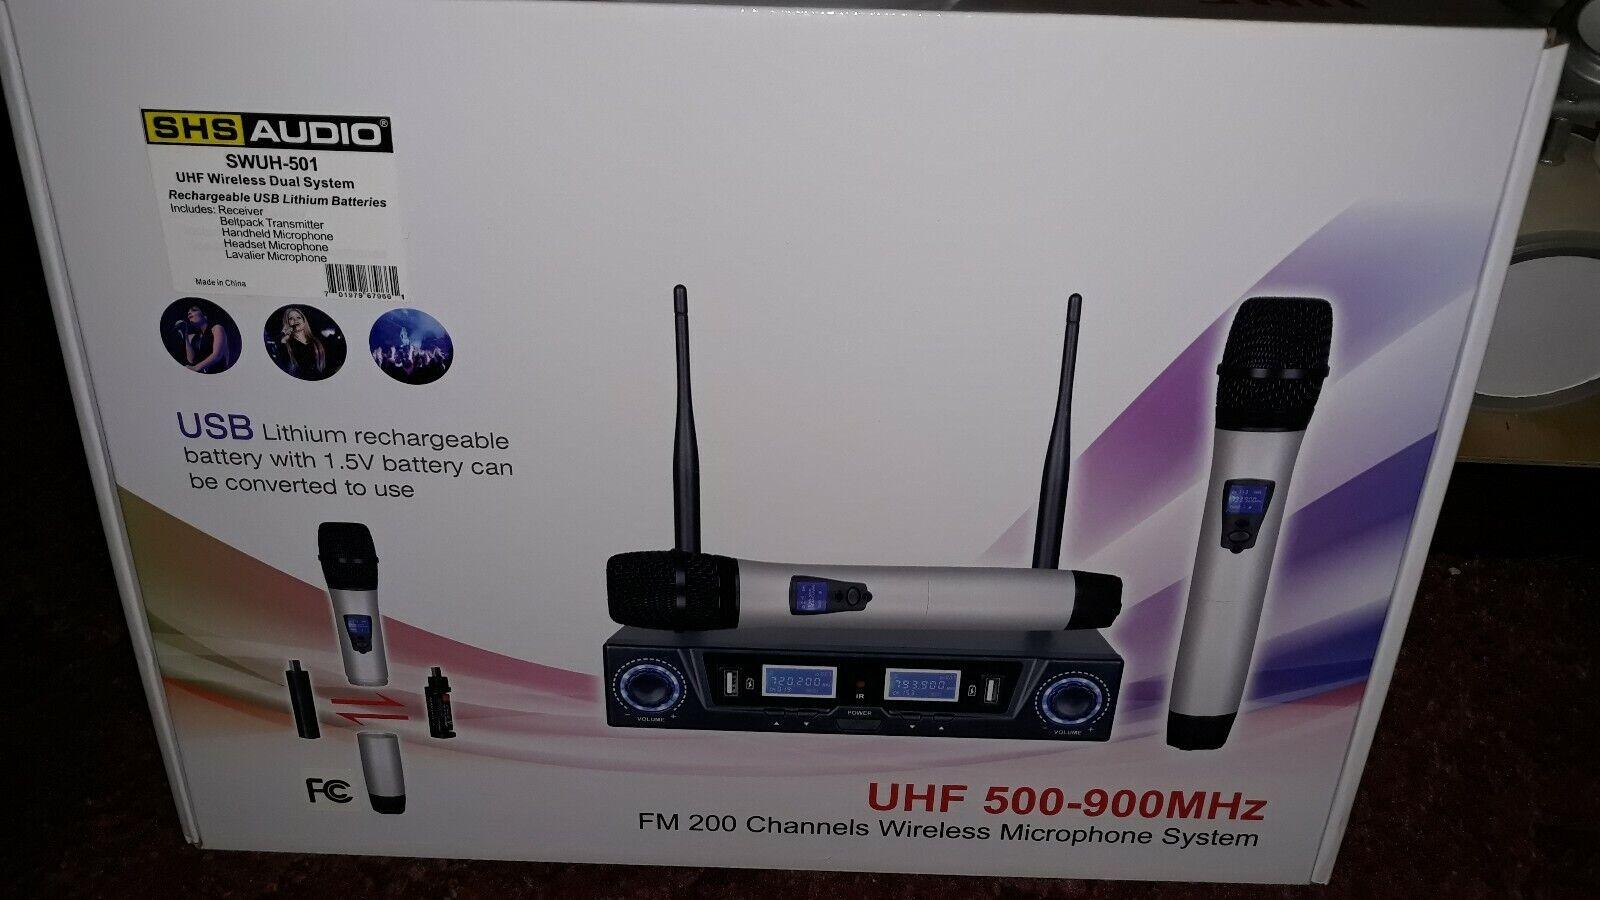 Professional uhf wireless microphone system